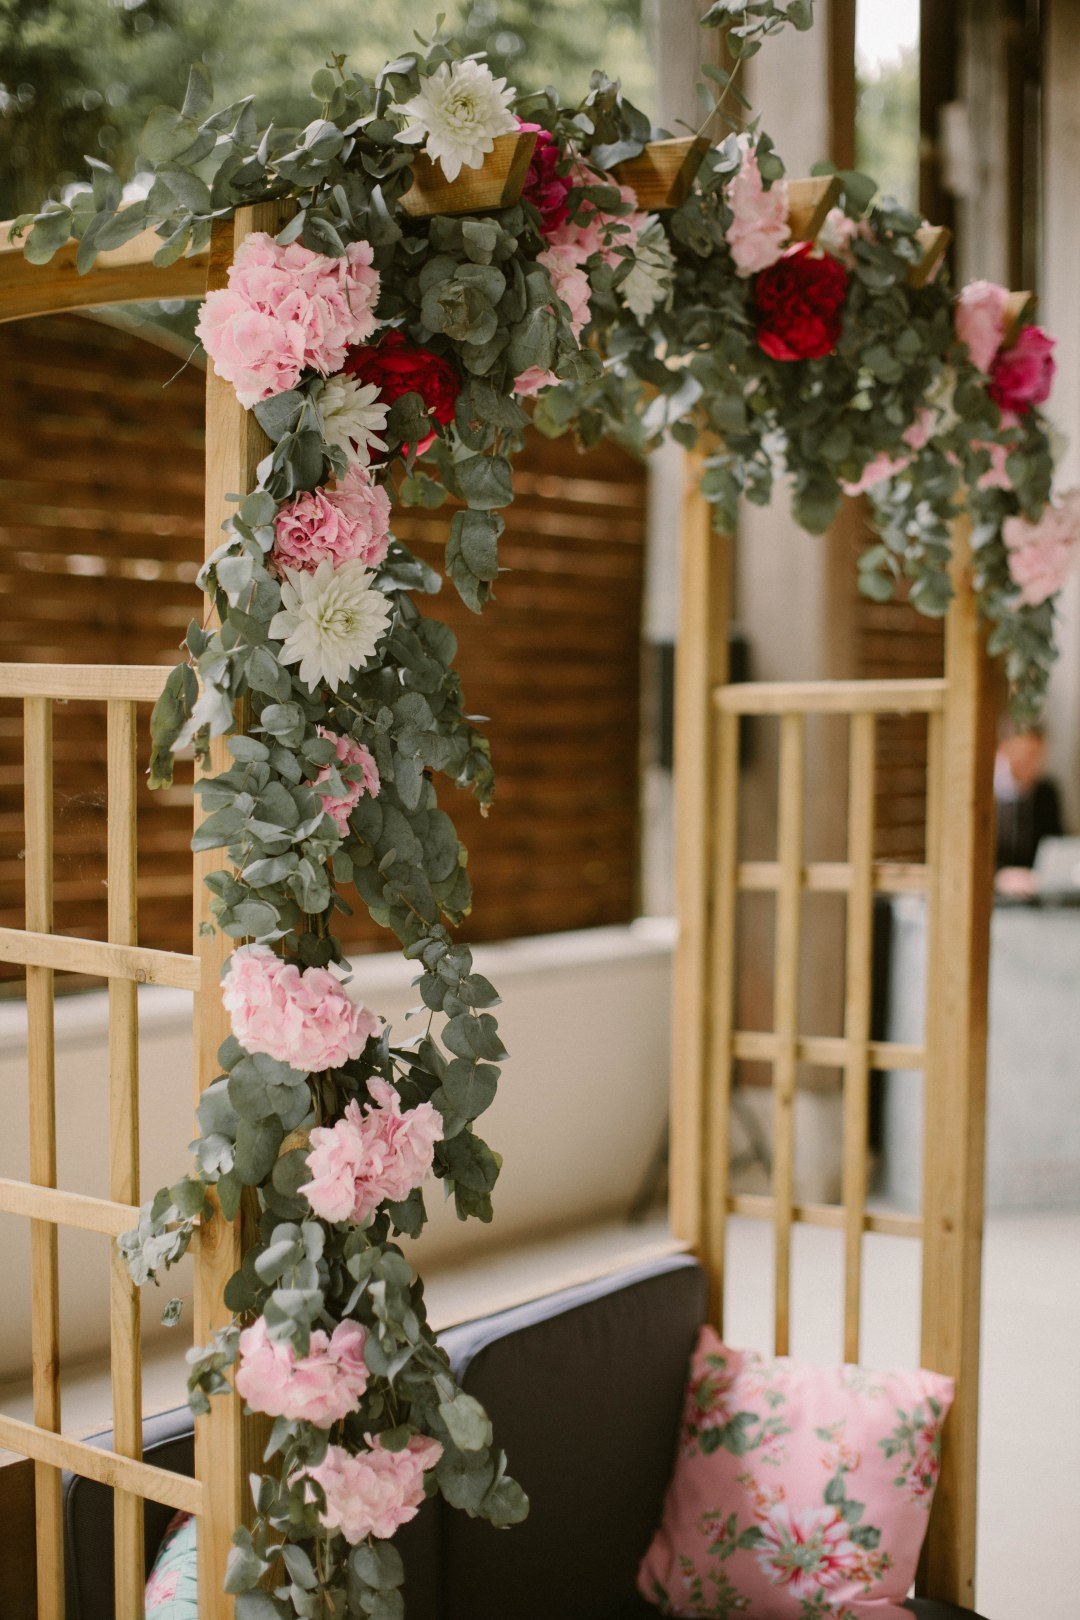 arche-fleurs-feuillage-mariage